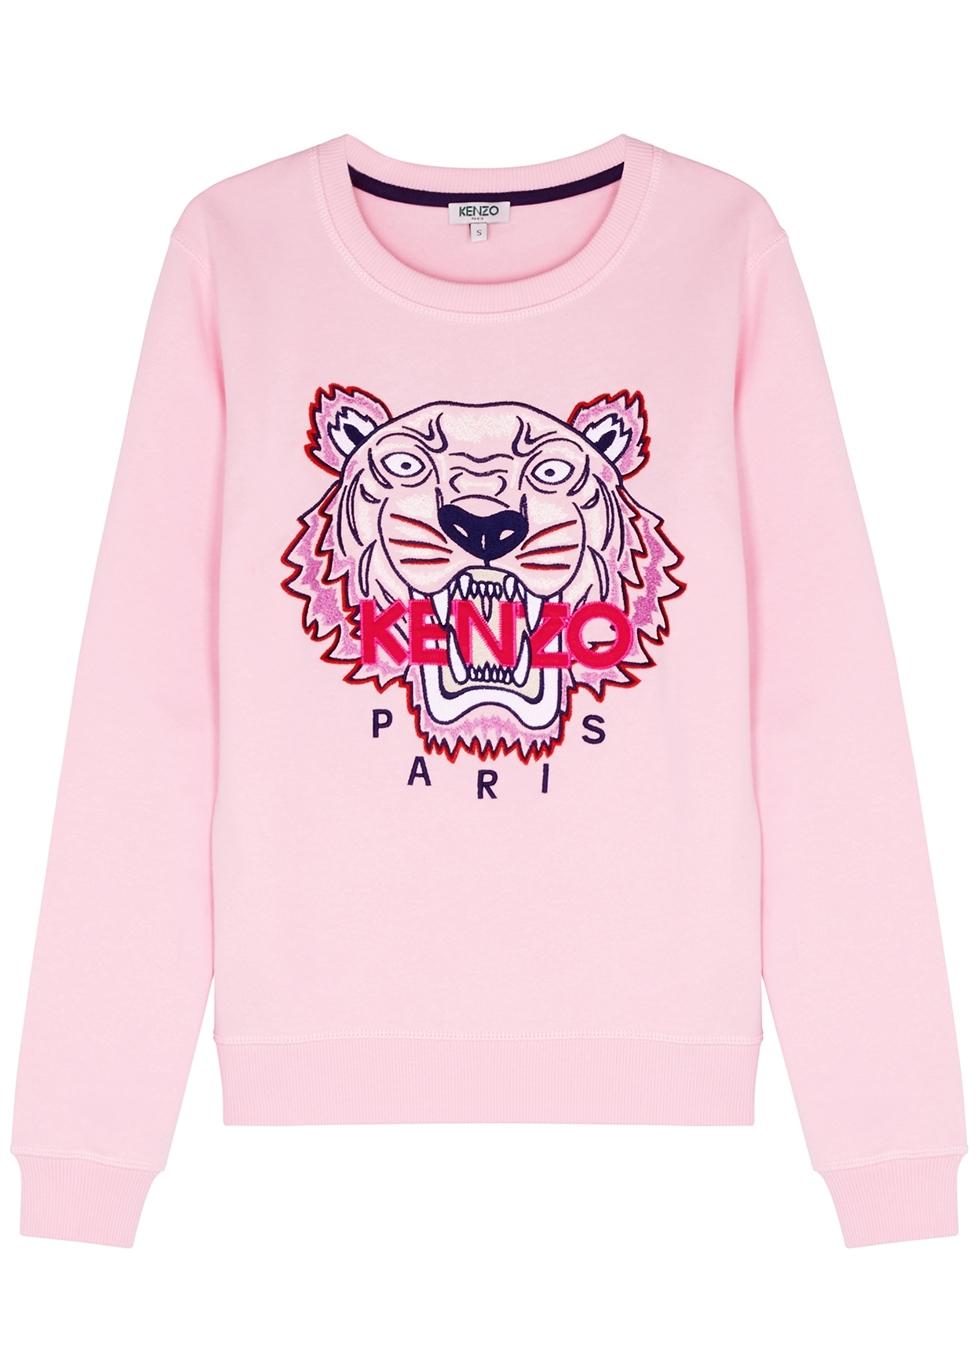 900b1d05efc7 Kenzo - Designer Sweatshirts